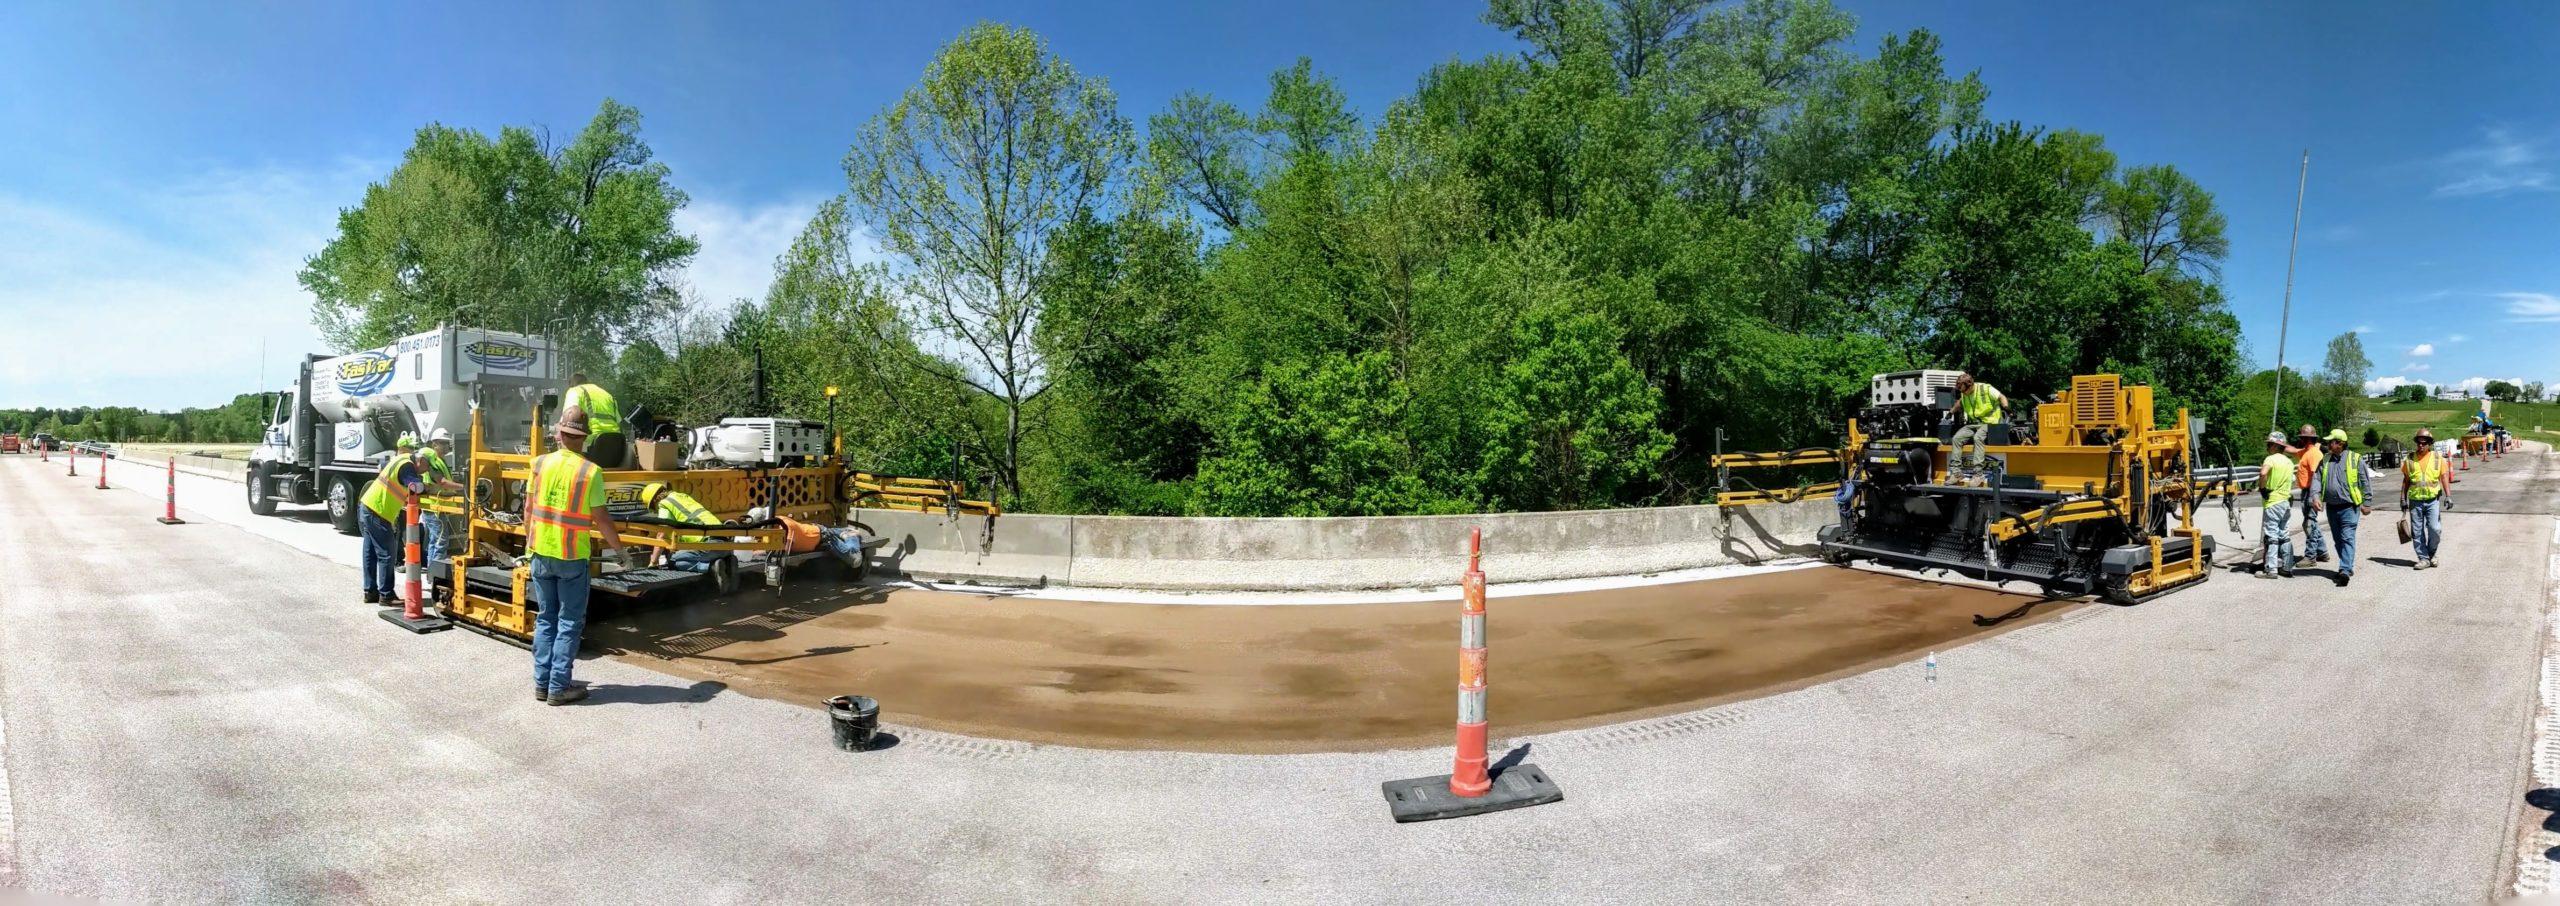 FasTrac Hybrid Polymer Concrete Bridge Deck Overlay